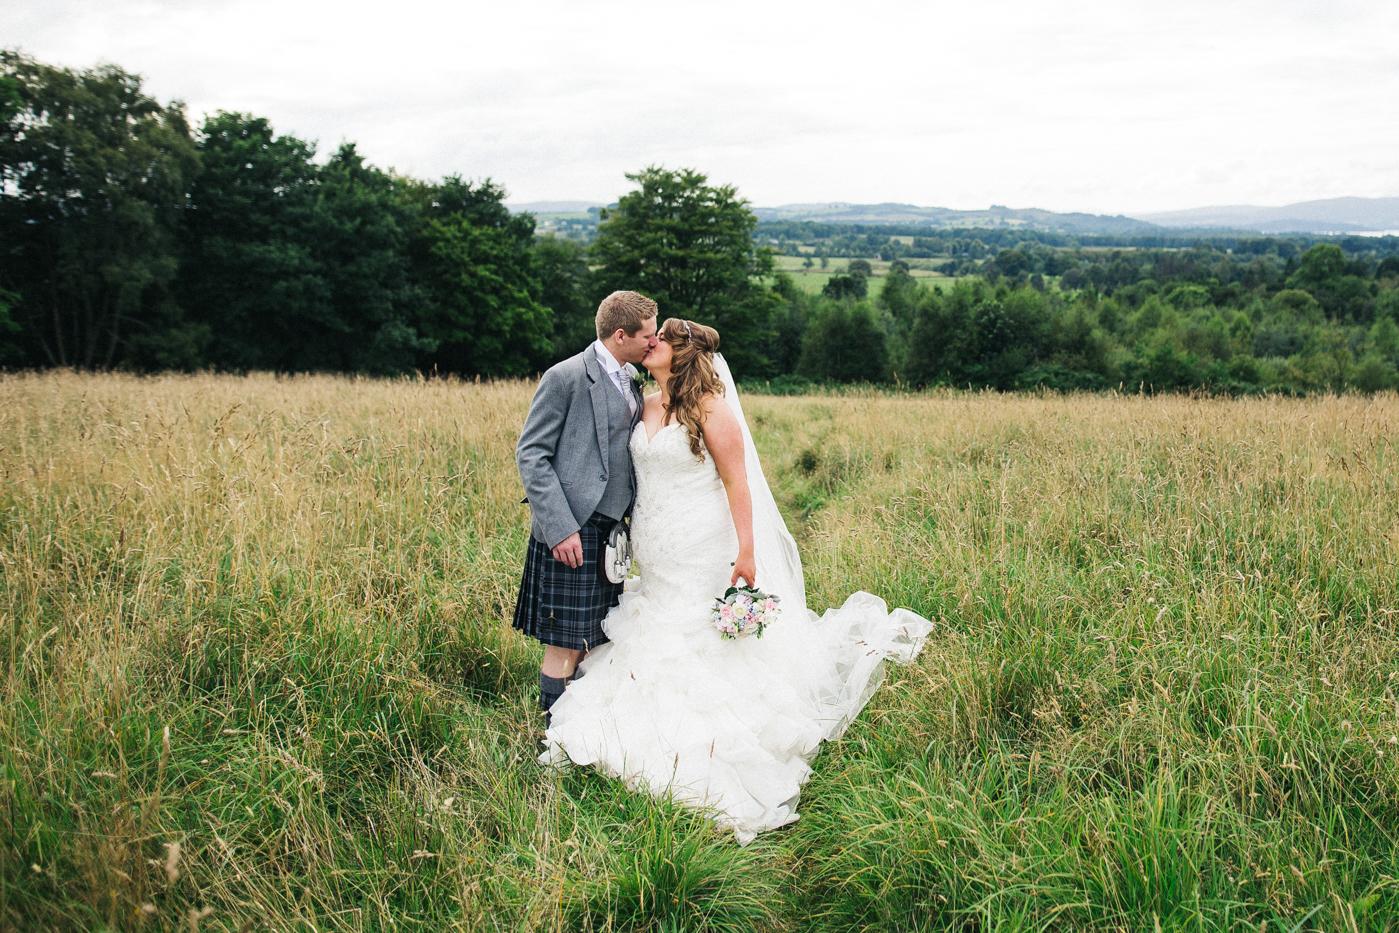 creative-wedding-photography-teesside-north-east-yorkshire-57.jpg